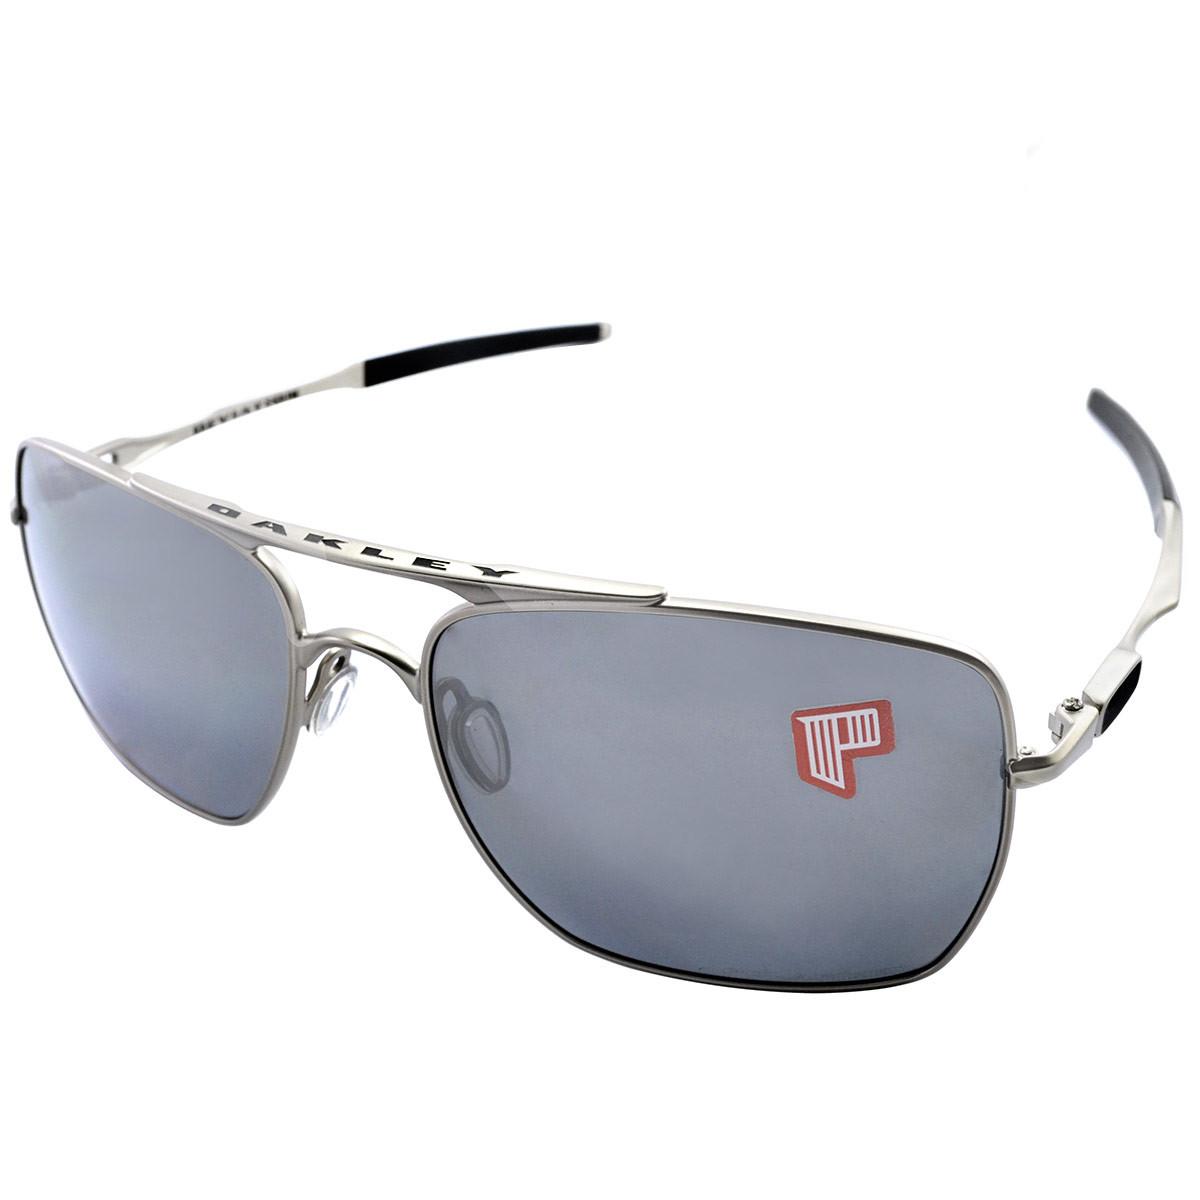 Oculos Oakley Deviation Ligth W Black Iridium Polarizado ref OO4061-06 0cf6447643